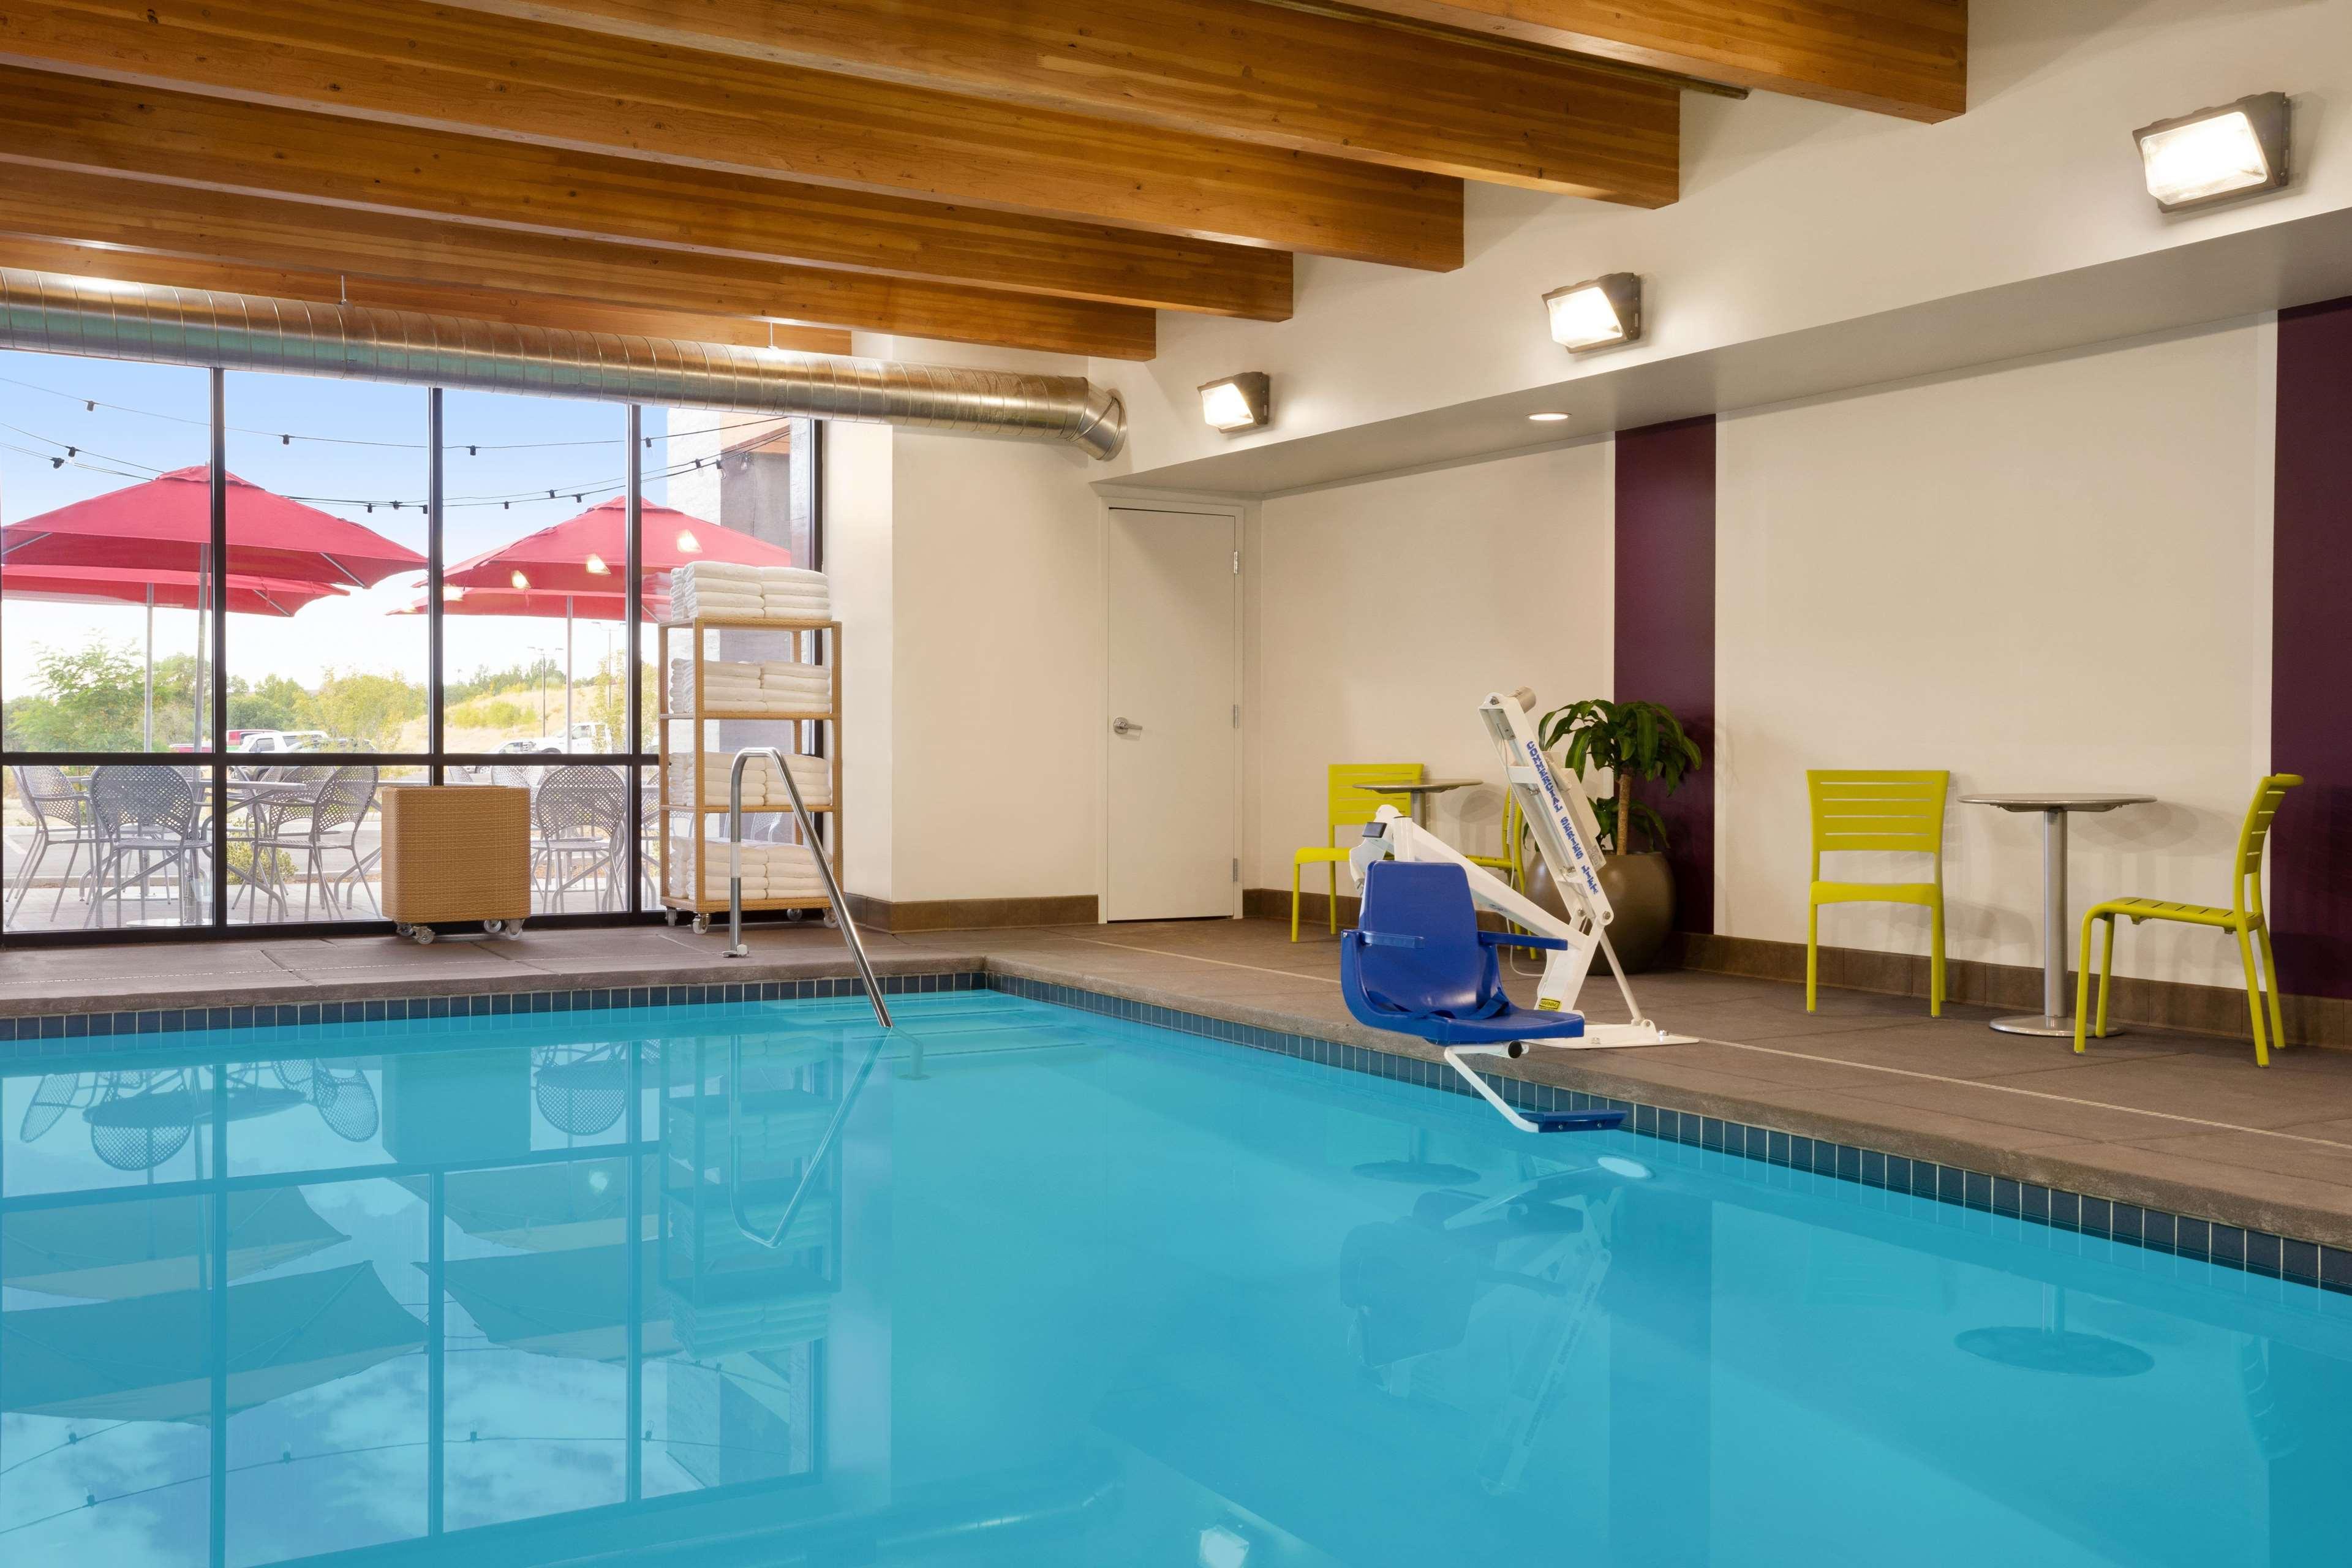 Home2 Suites by Hilton Elko image 9